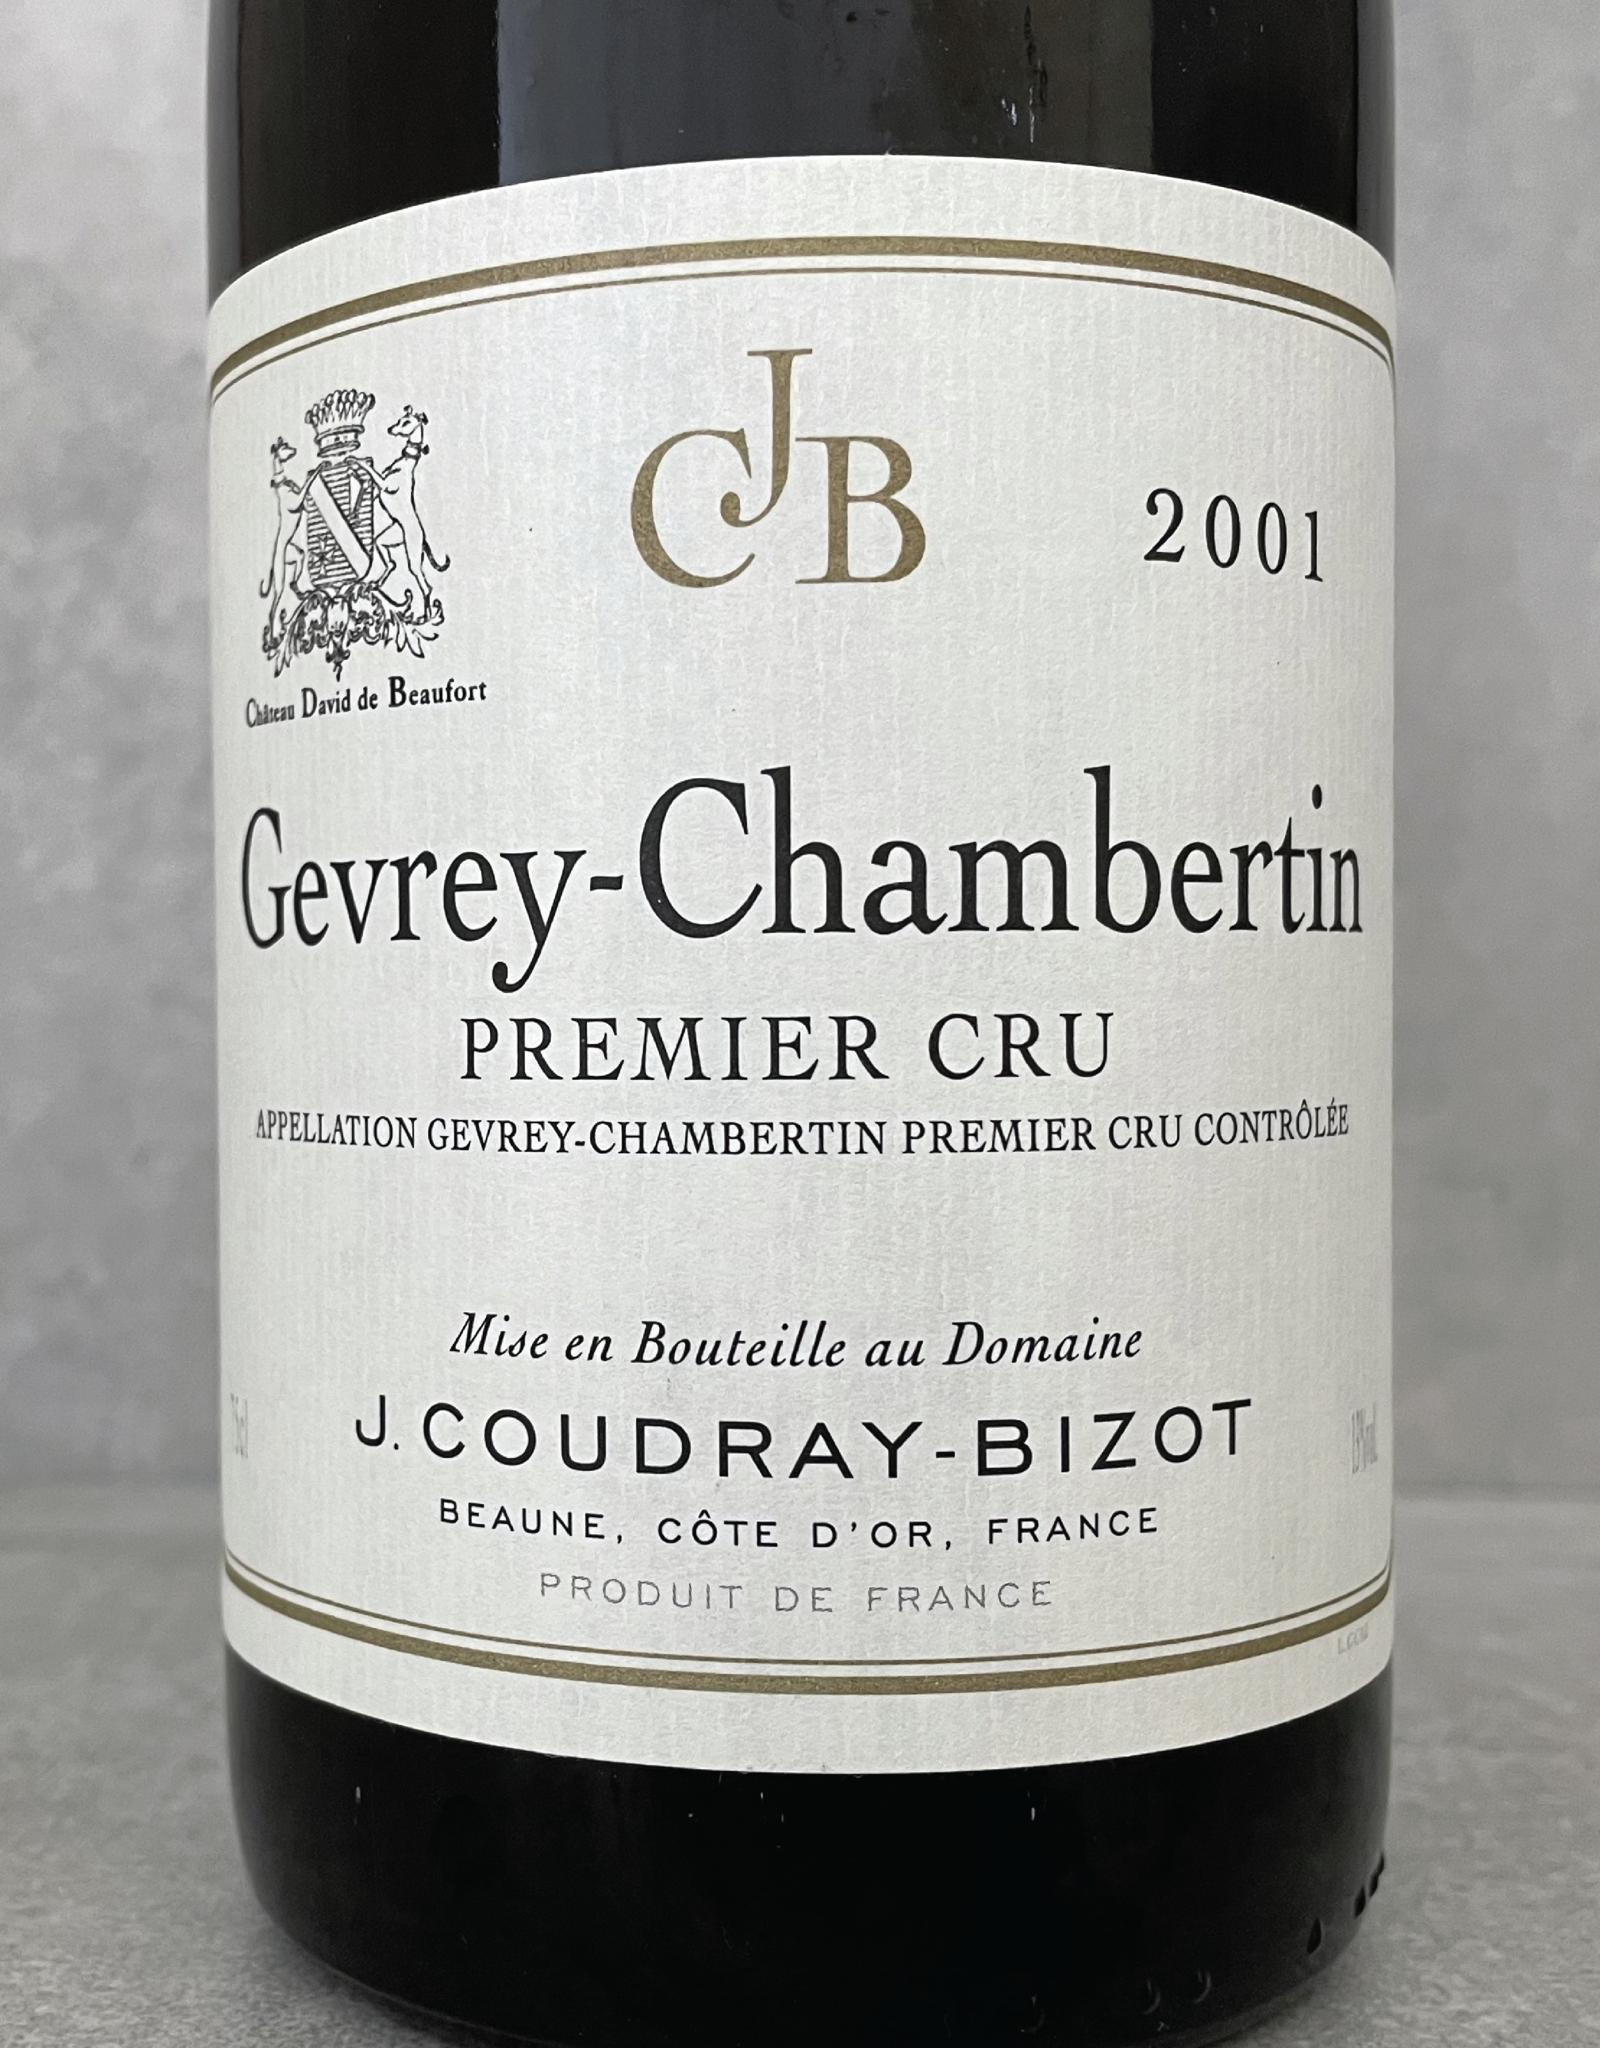 Domaine Coudray-Bizot Gevrey Chambertin 1er Cru 2001